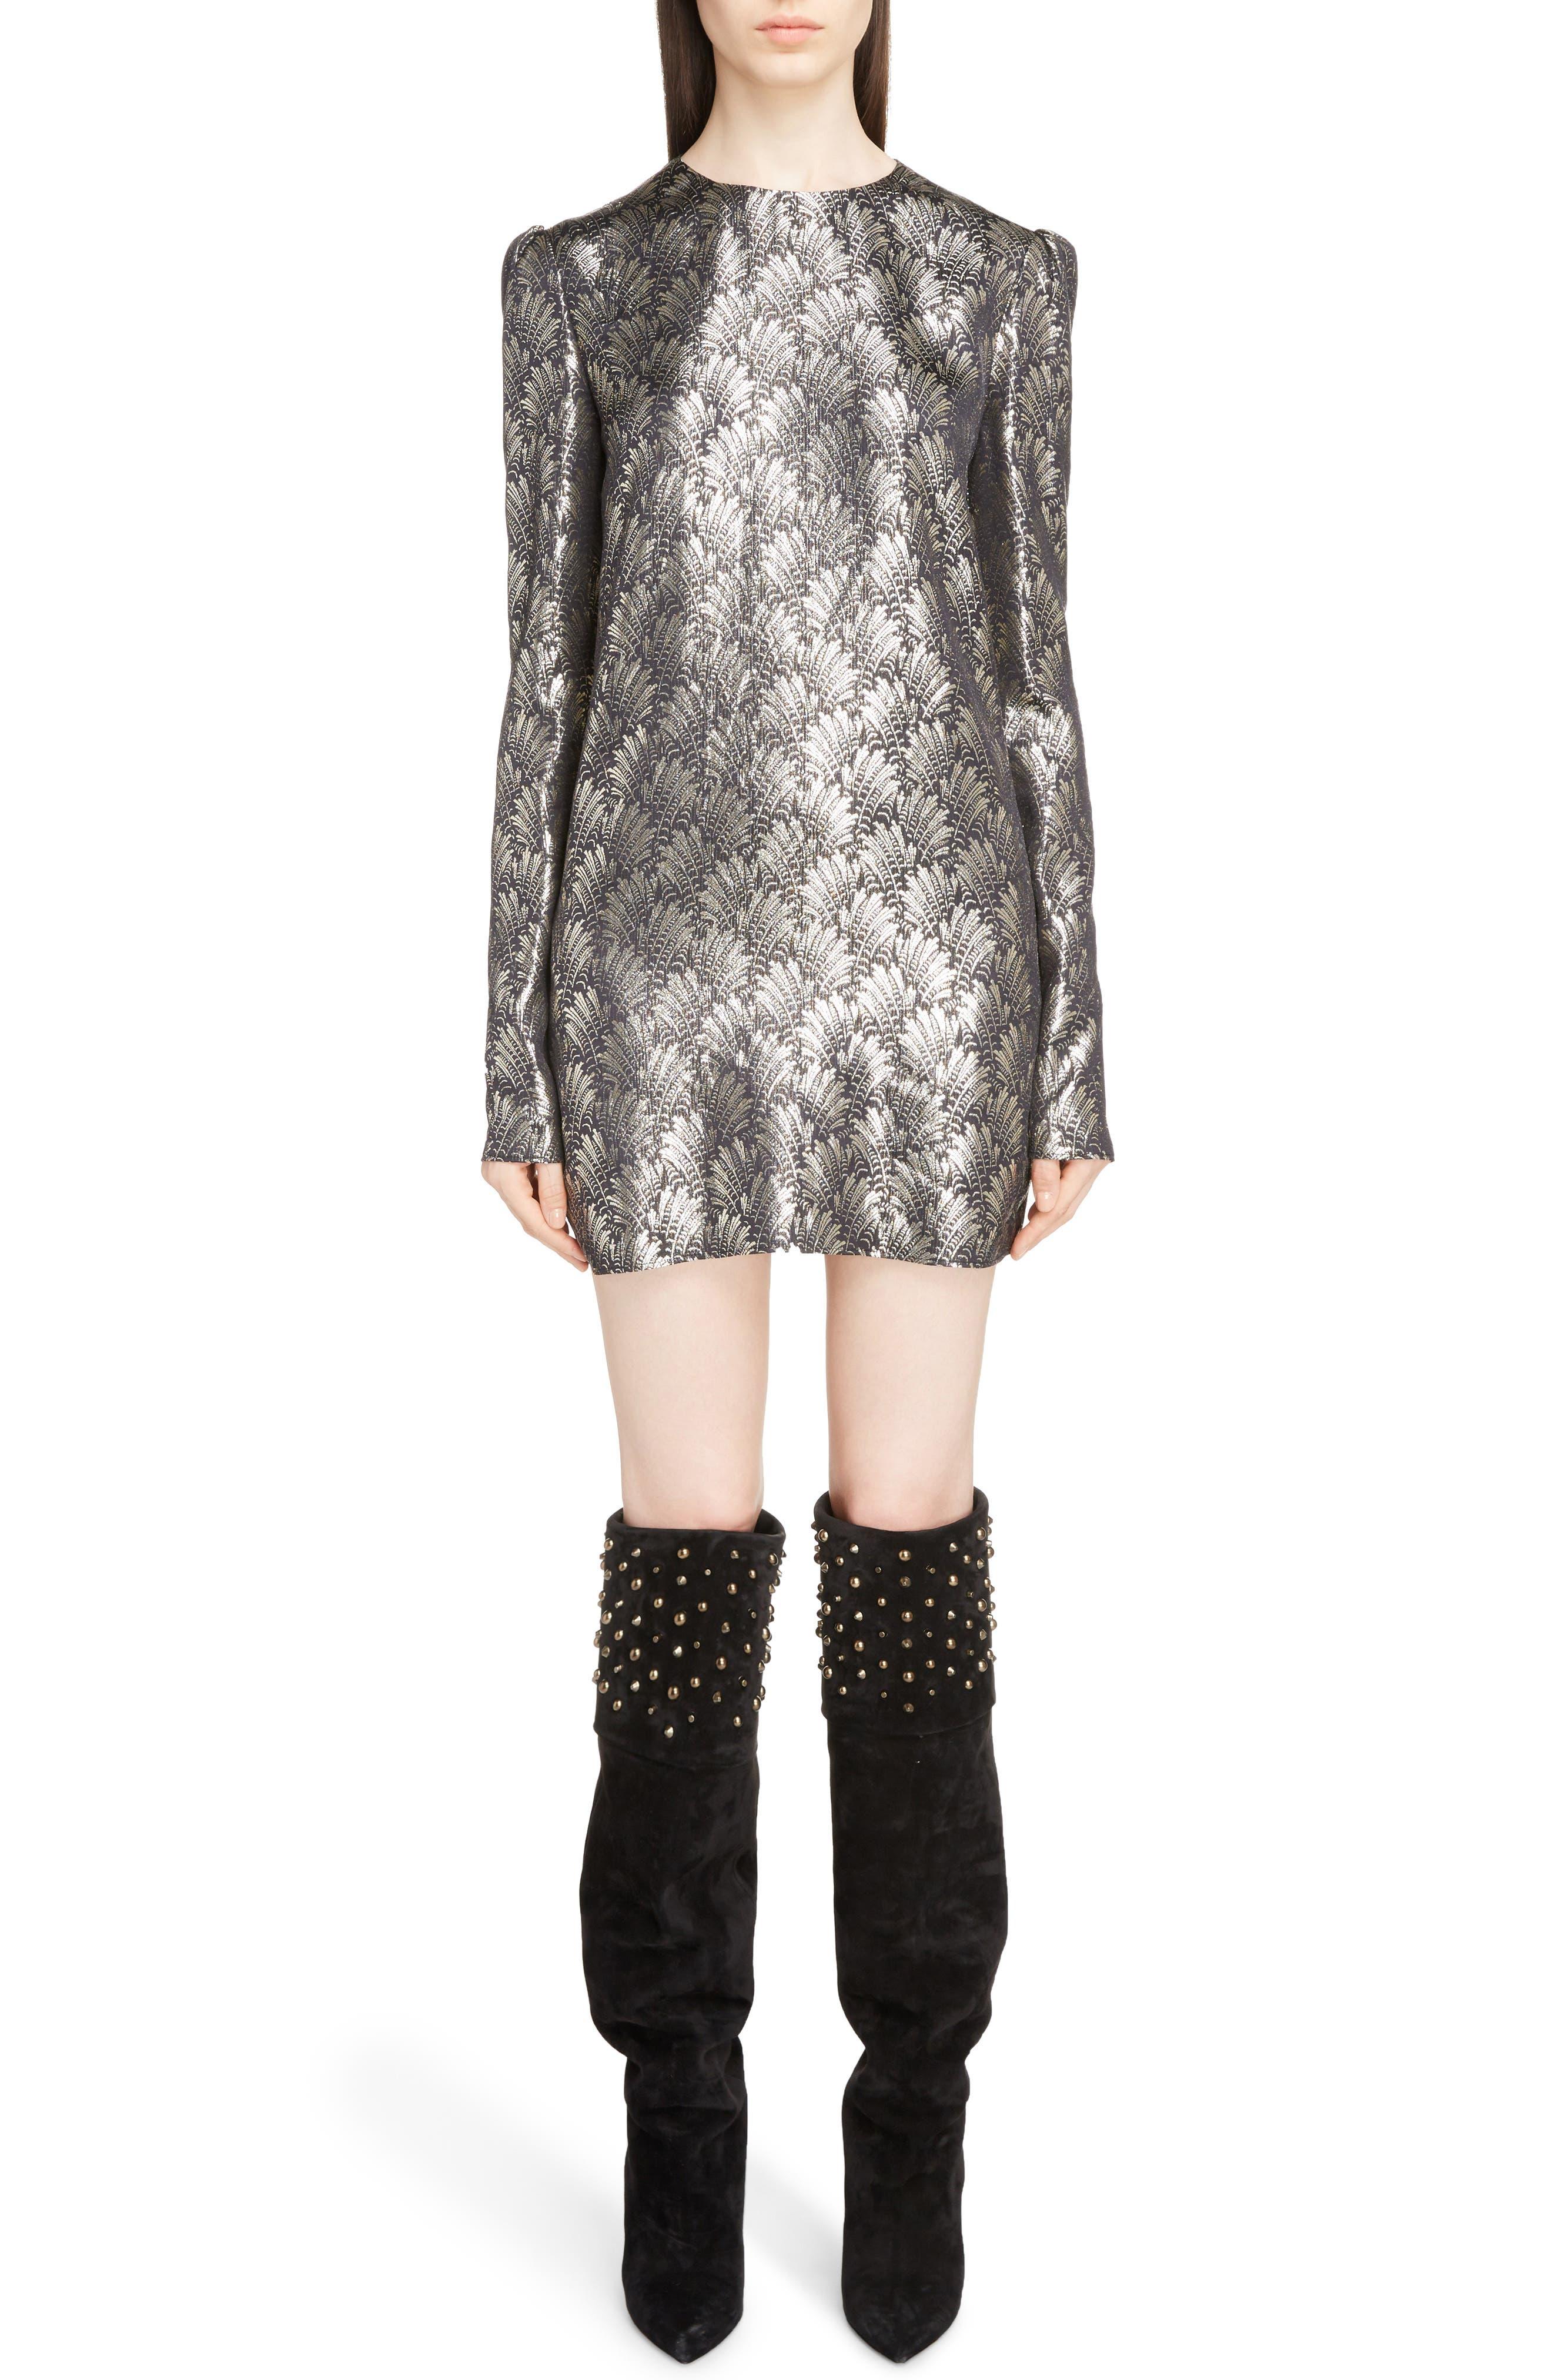 Saint Laurent Metallic Jacquard Shift Dress